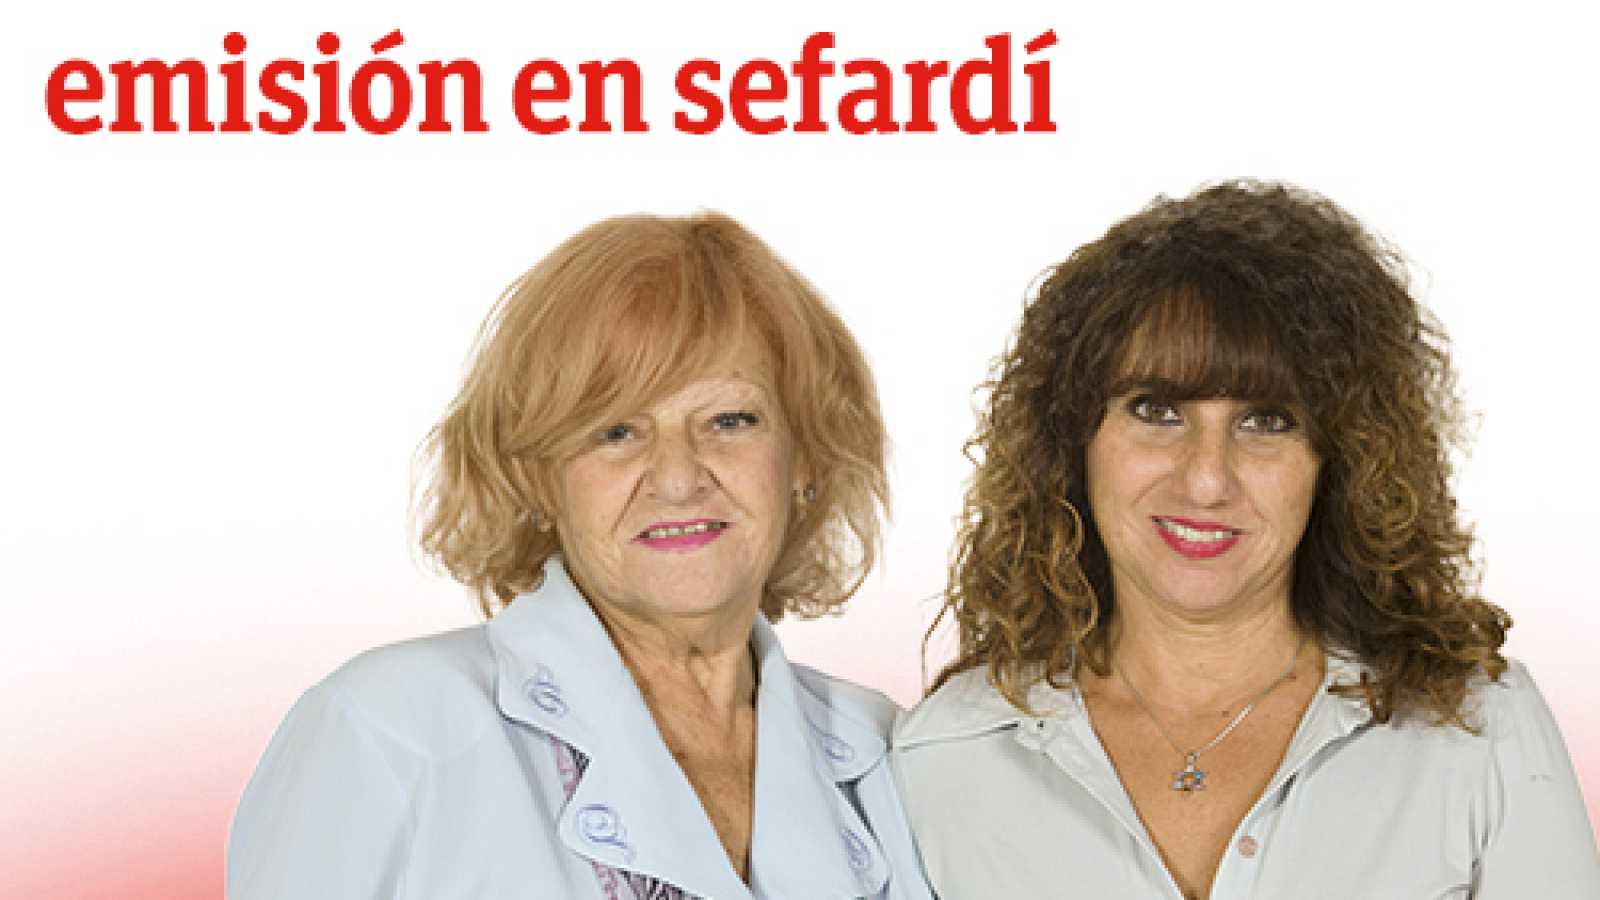 Emisión en sefardí - La nana sefardí: kantes para soñar - 22/11/20 - Escuchar ahora